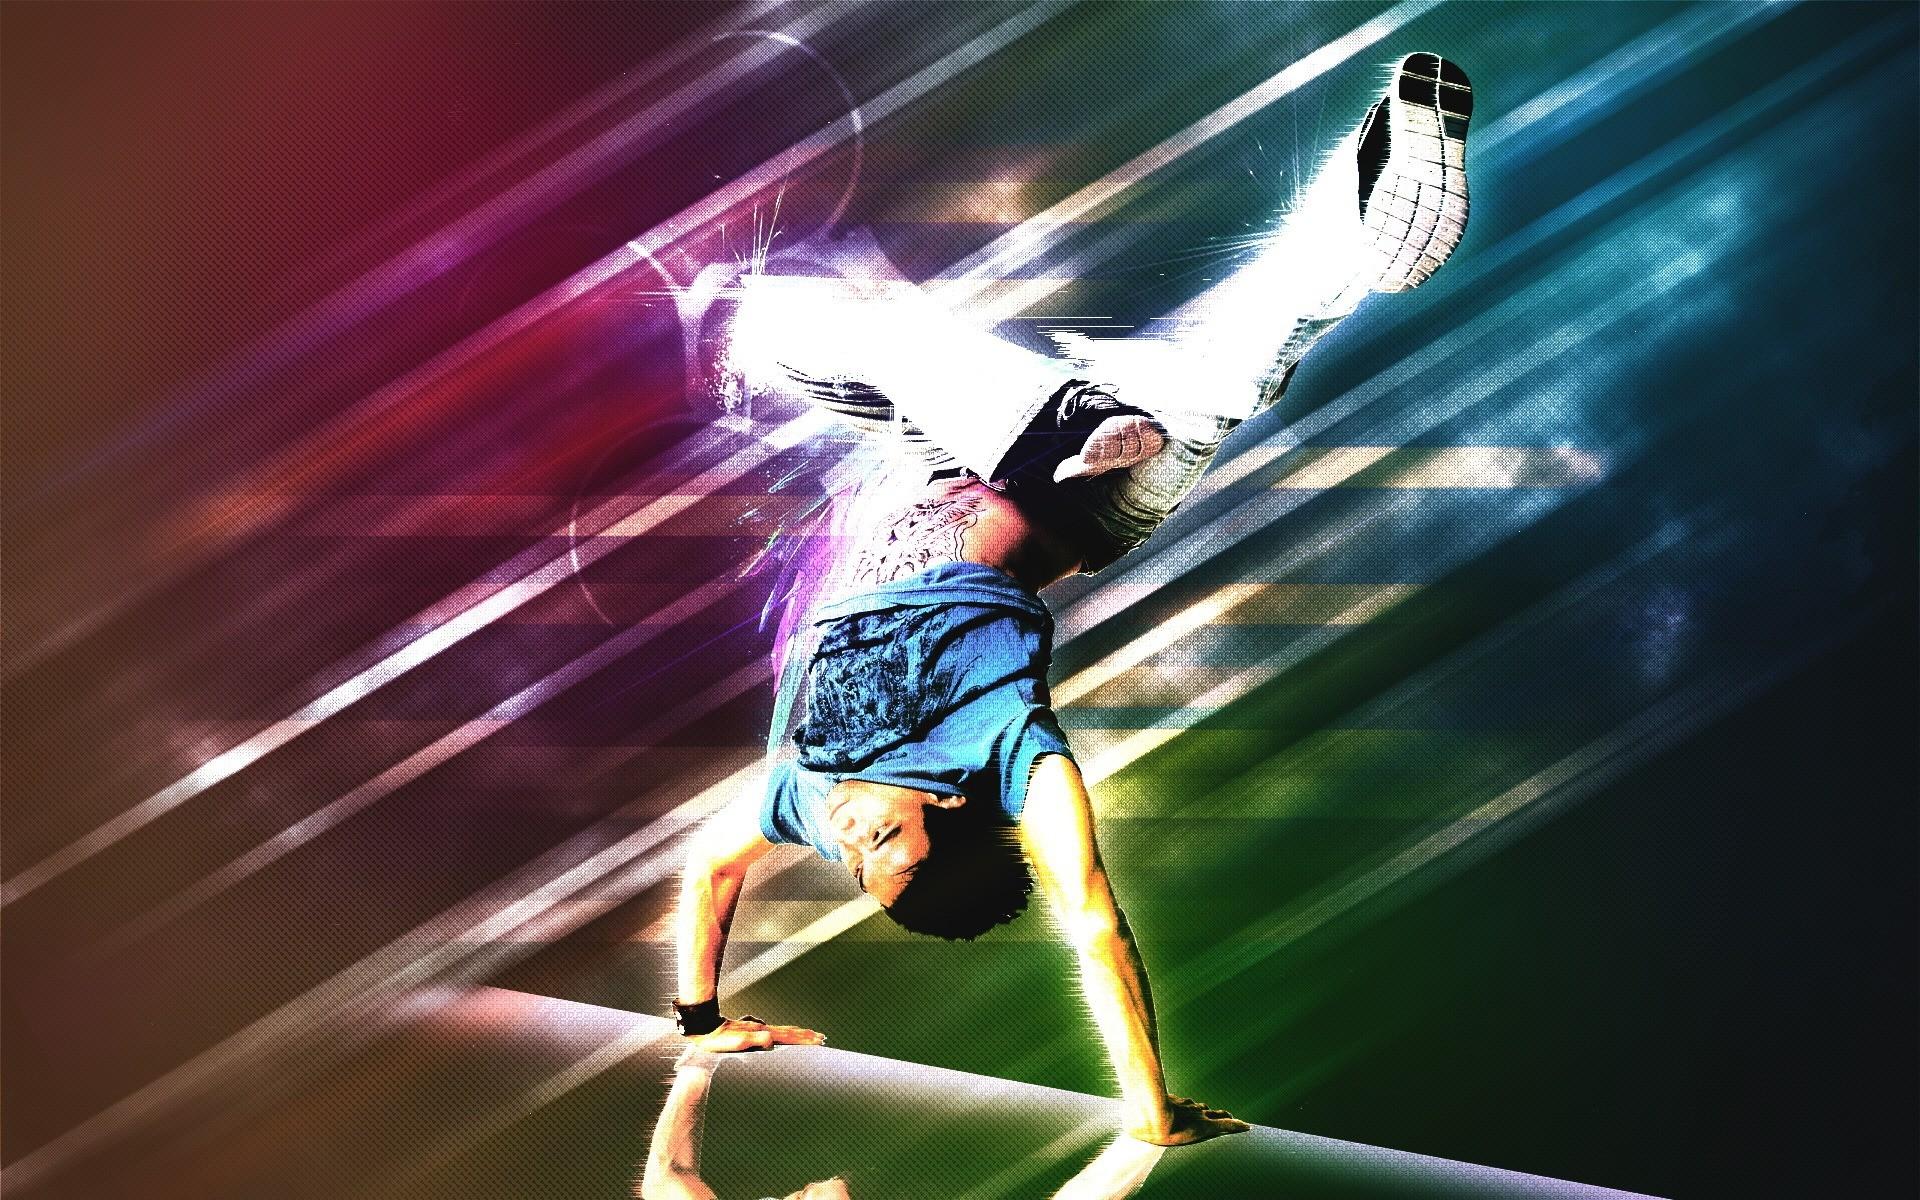 3d Dance Wallpapers For Desktop Hd 500x500 3d Dance: Bboy Wallpaper (55+ Images